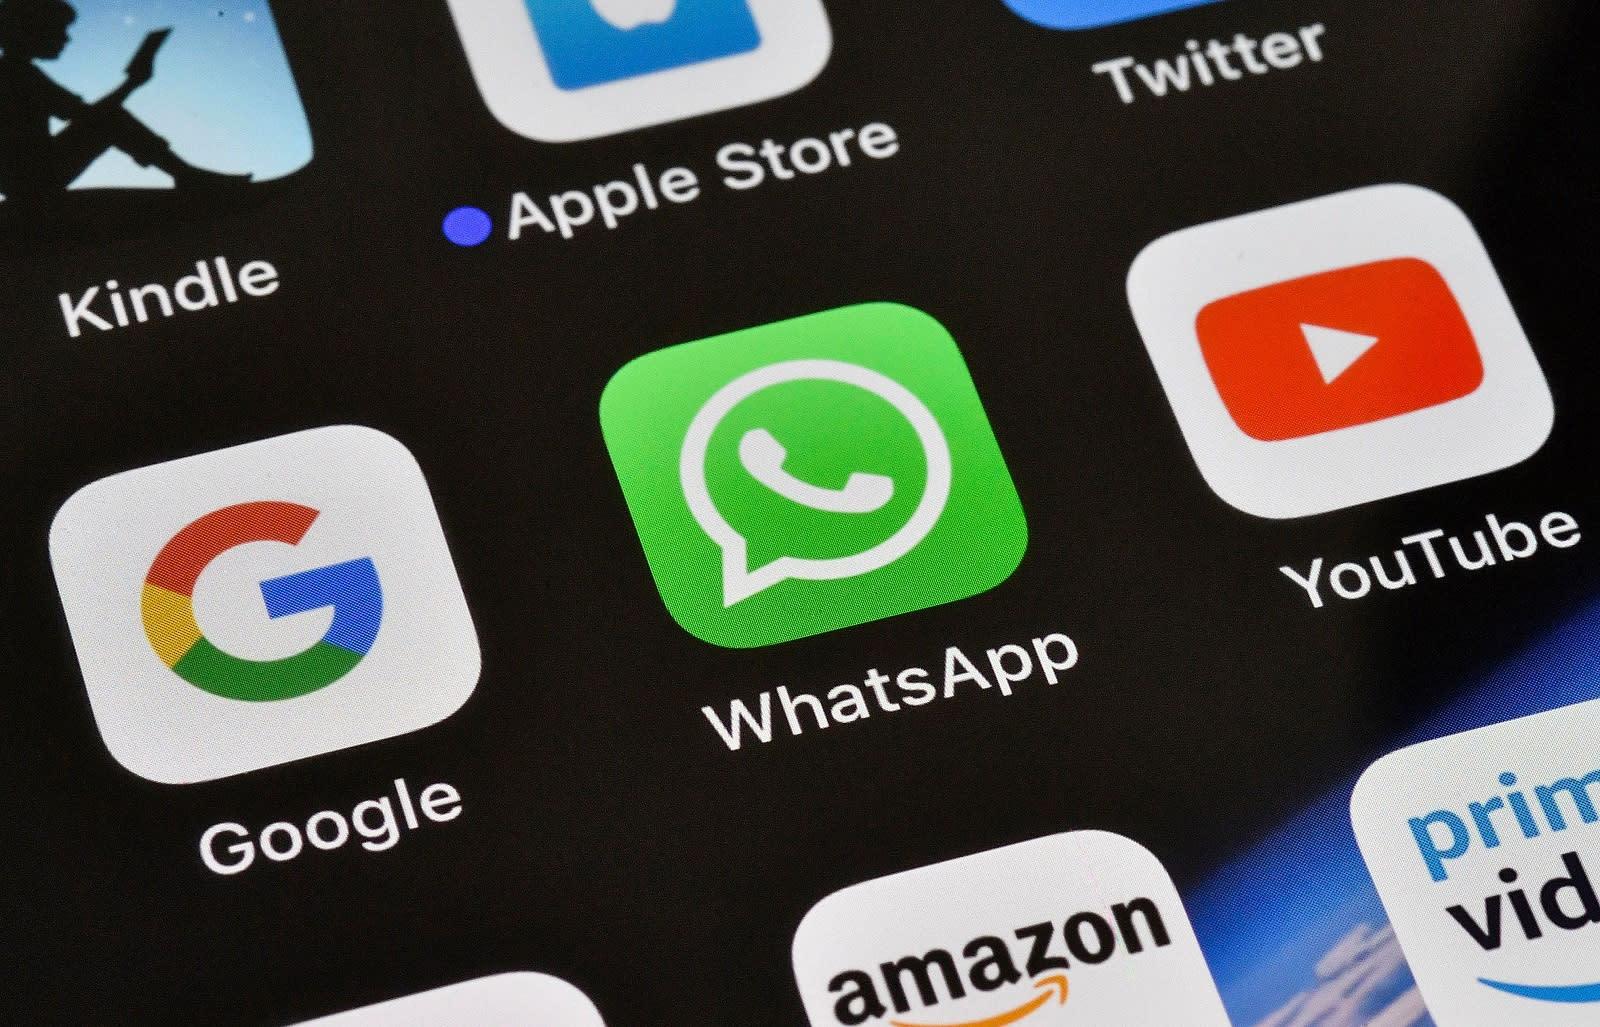 Whatsapps